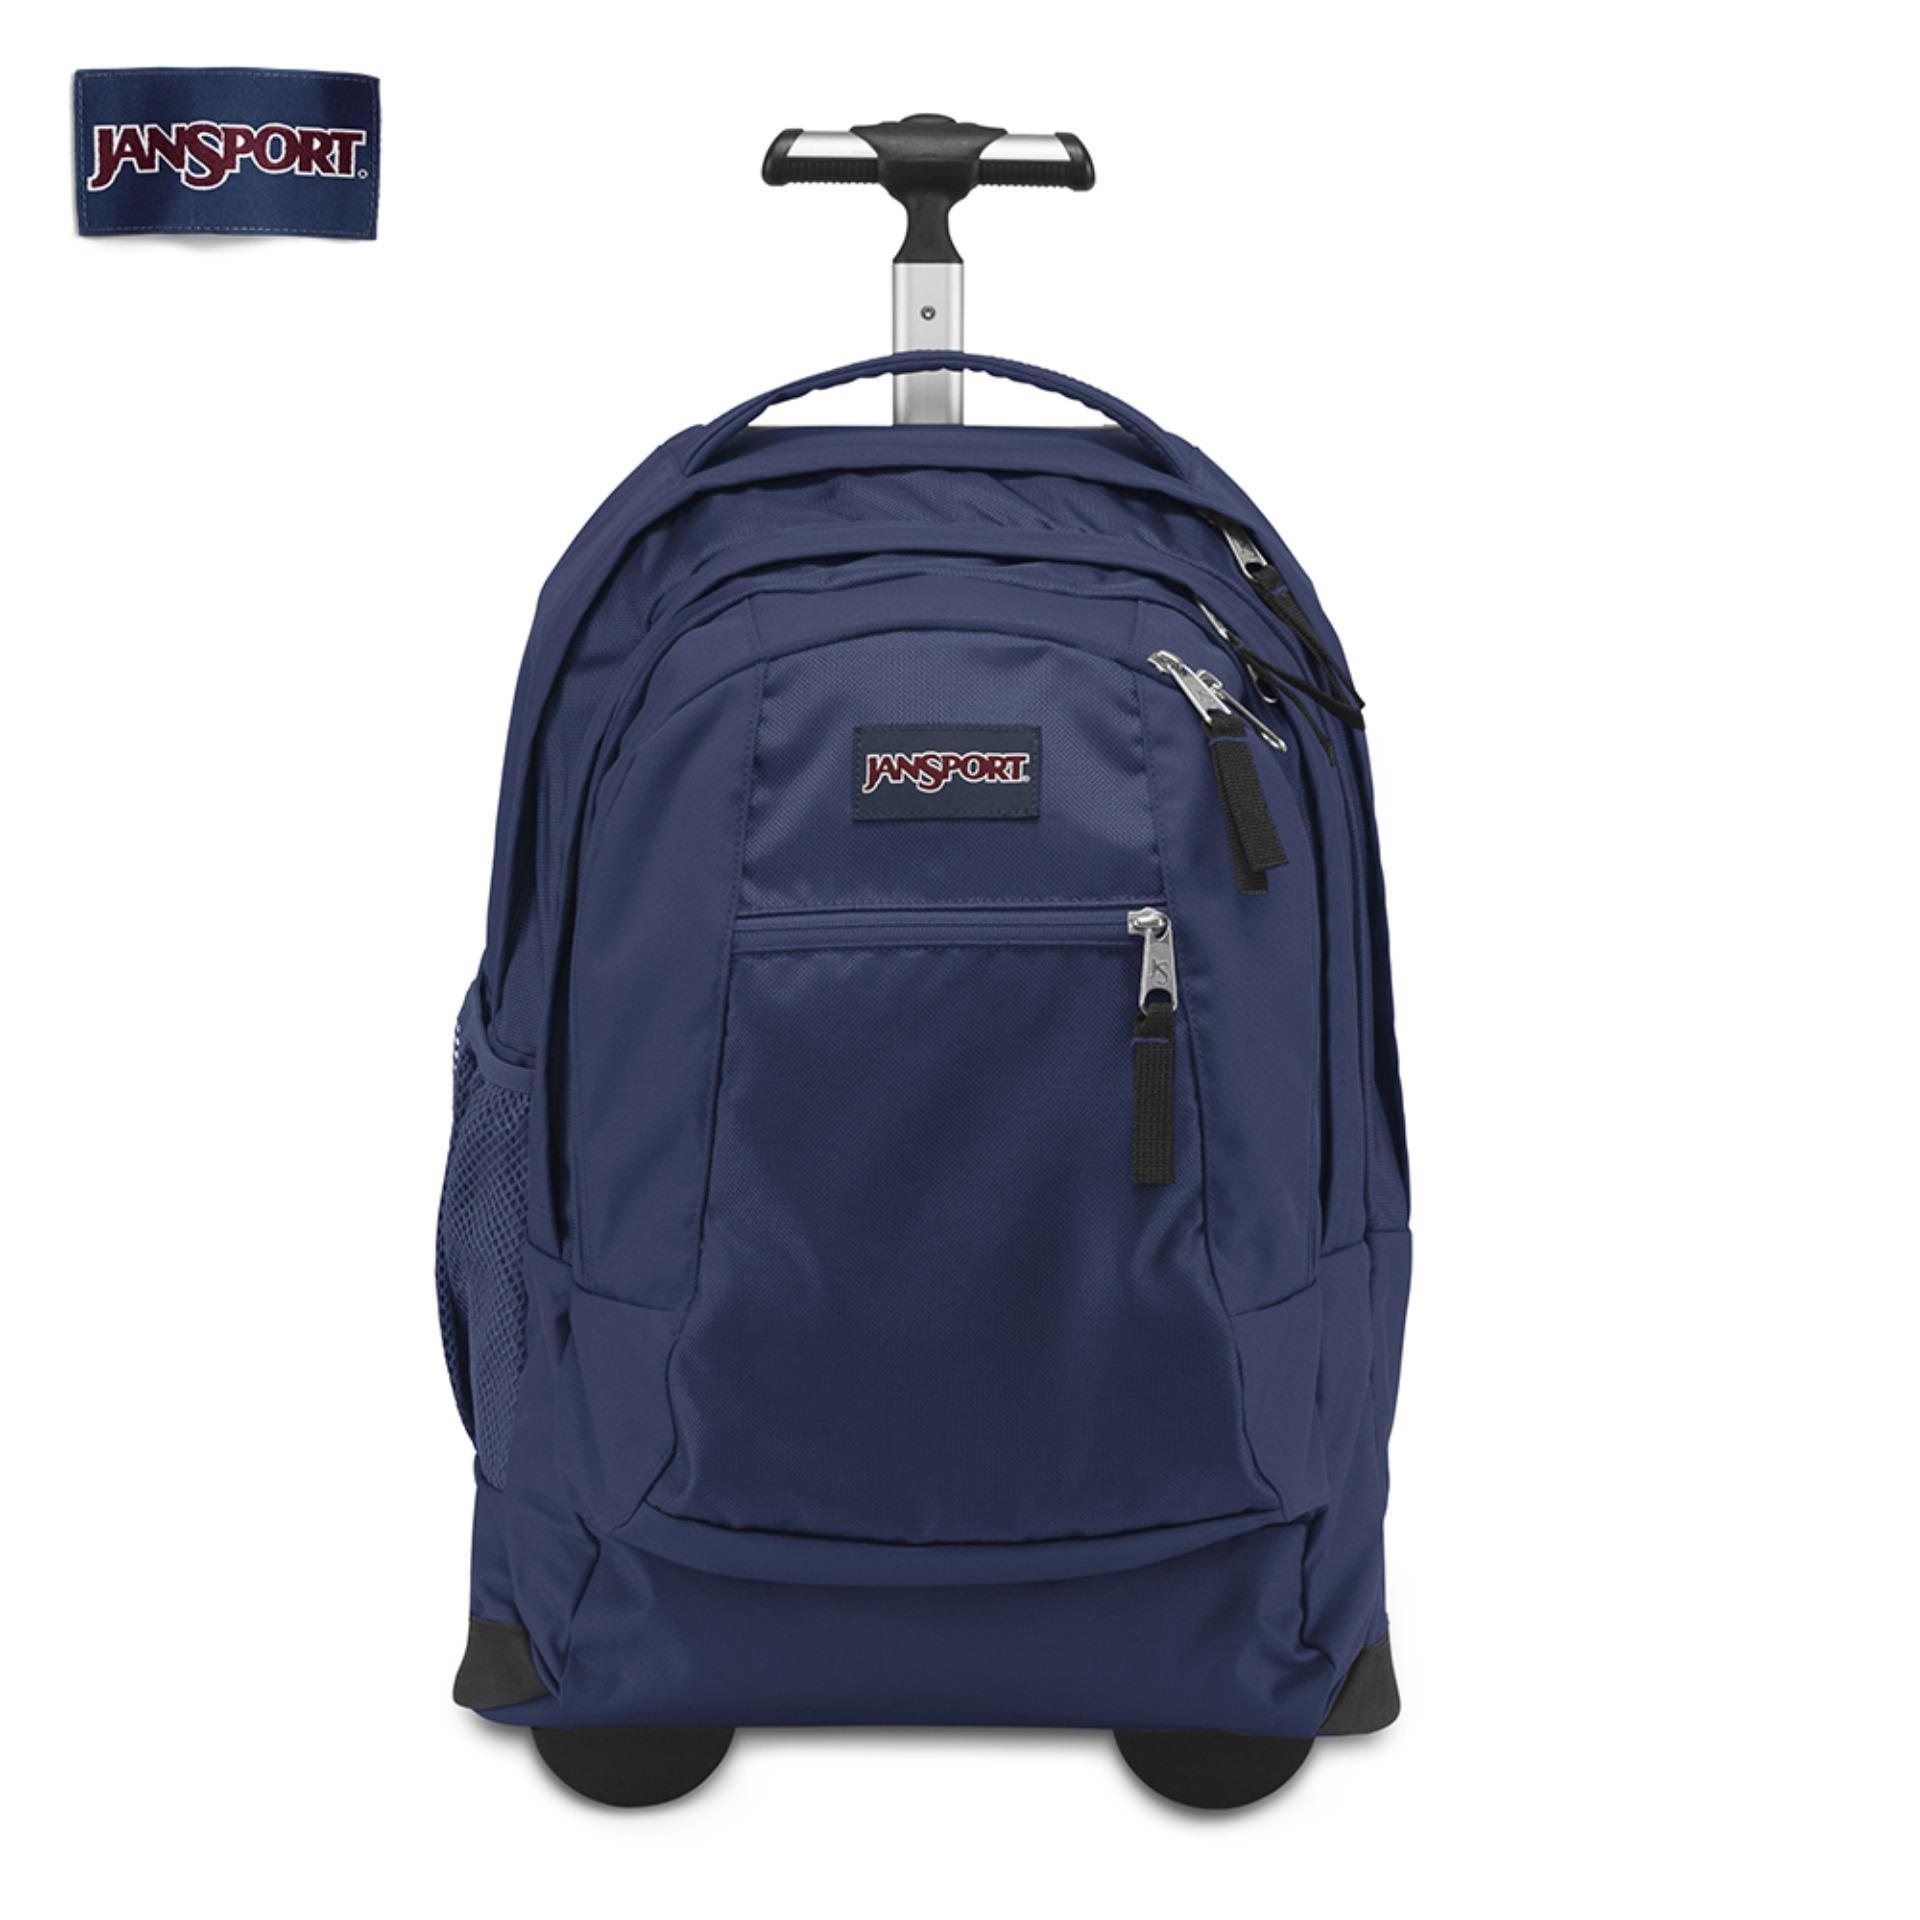 a60f97db7544 JanSport Philippines  JanSport price list - JanSport Bags ...